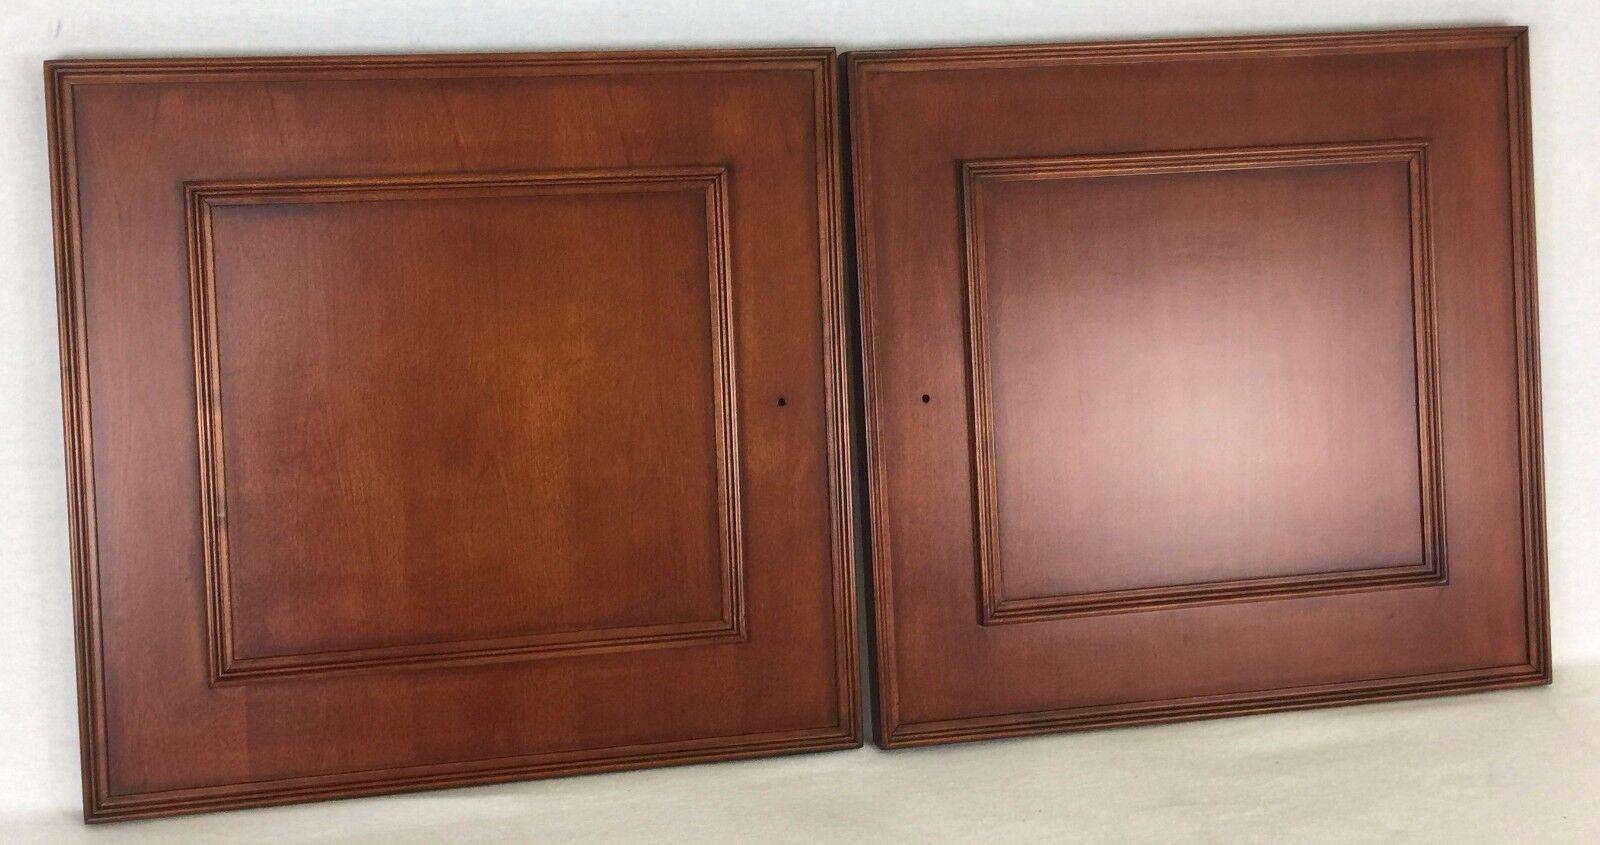 10 Pcs 18 1 4 X 19 1 4 Inch Solid Birch Hardwood Cabinet